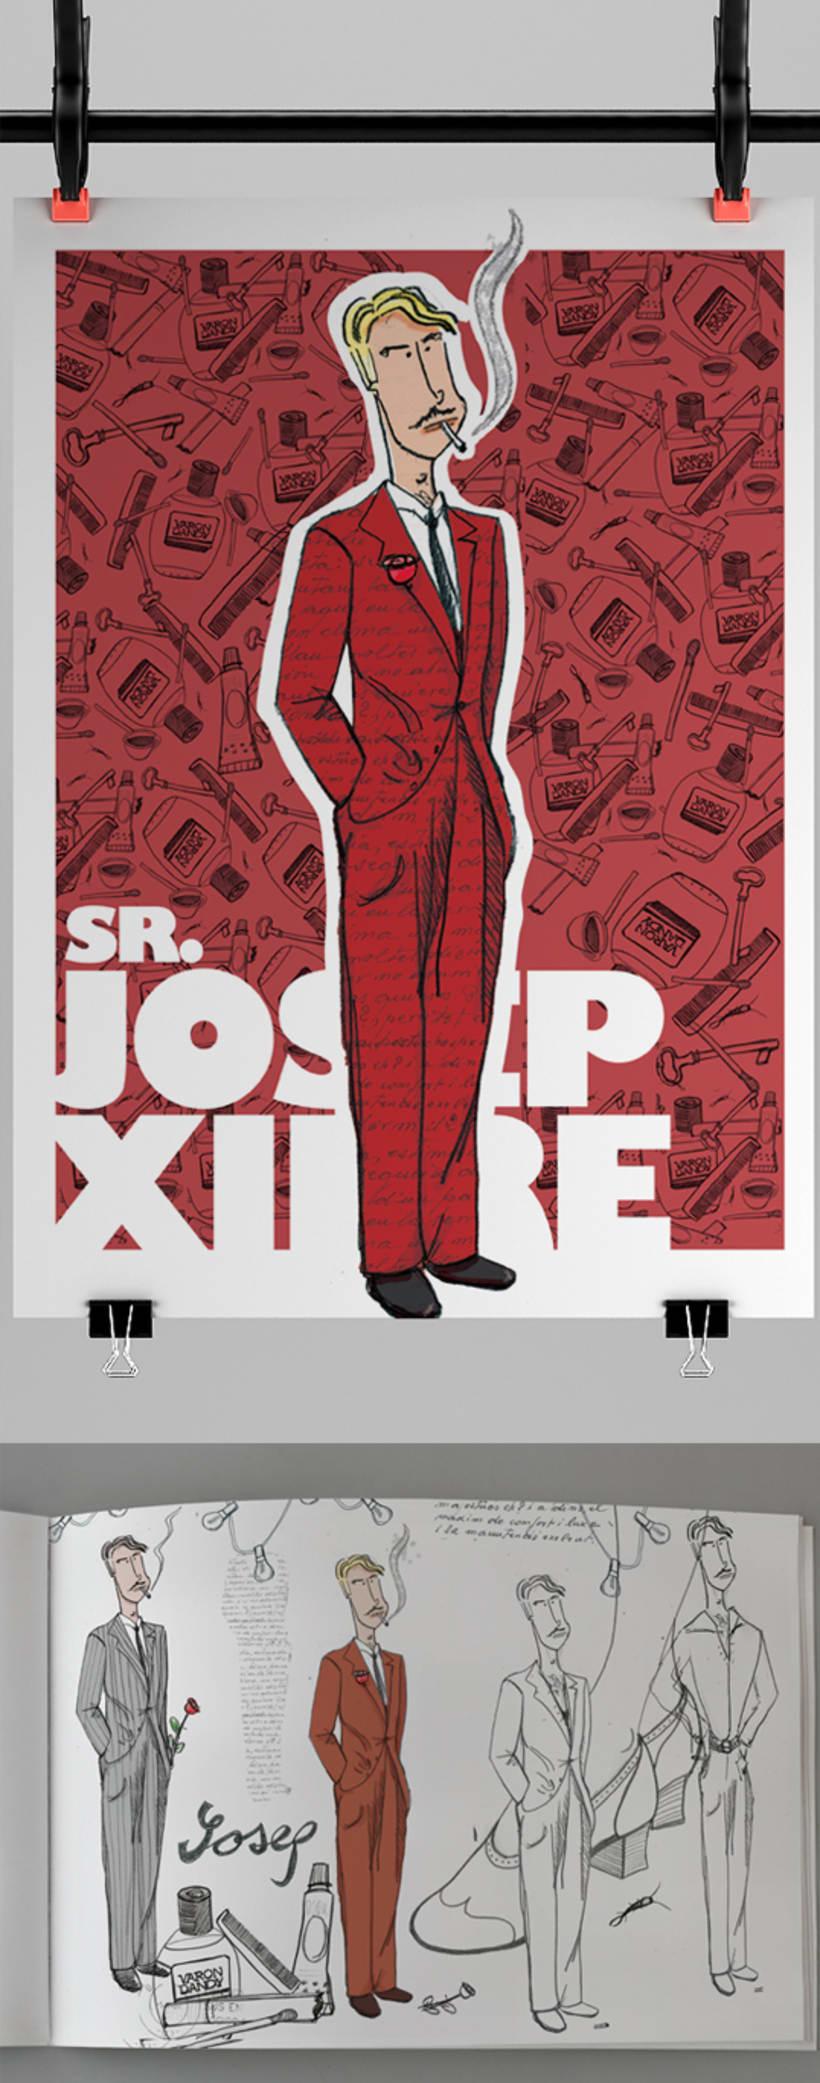 Sr. Josep Xifre -1